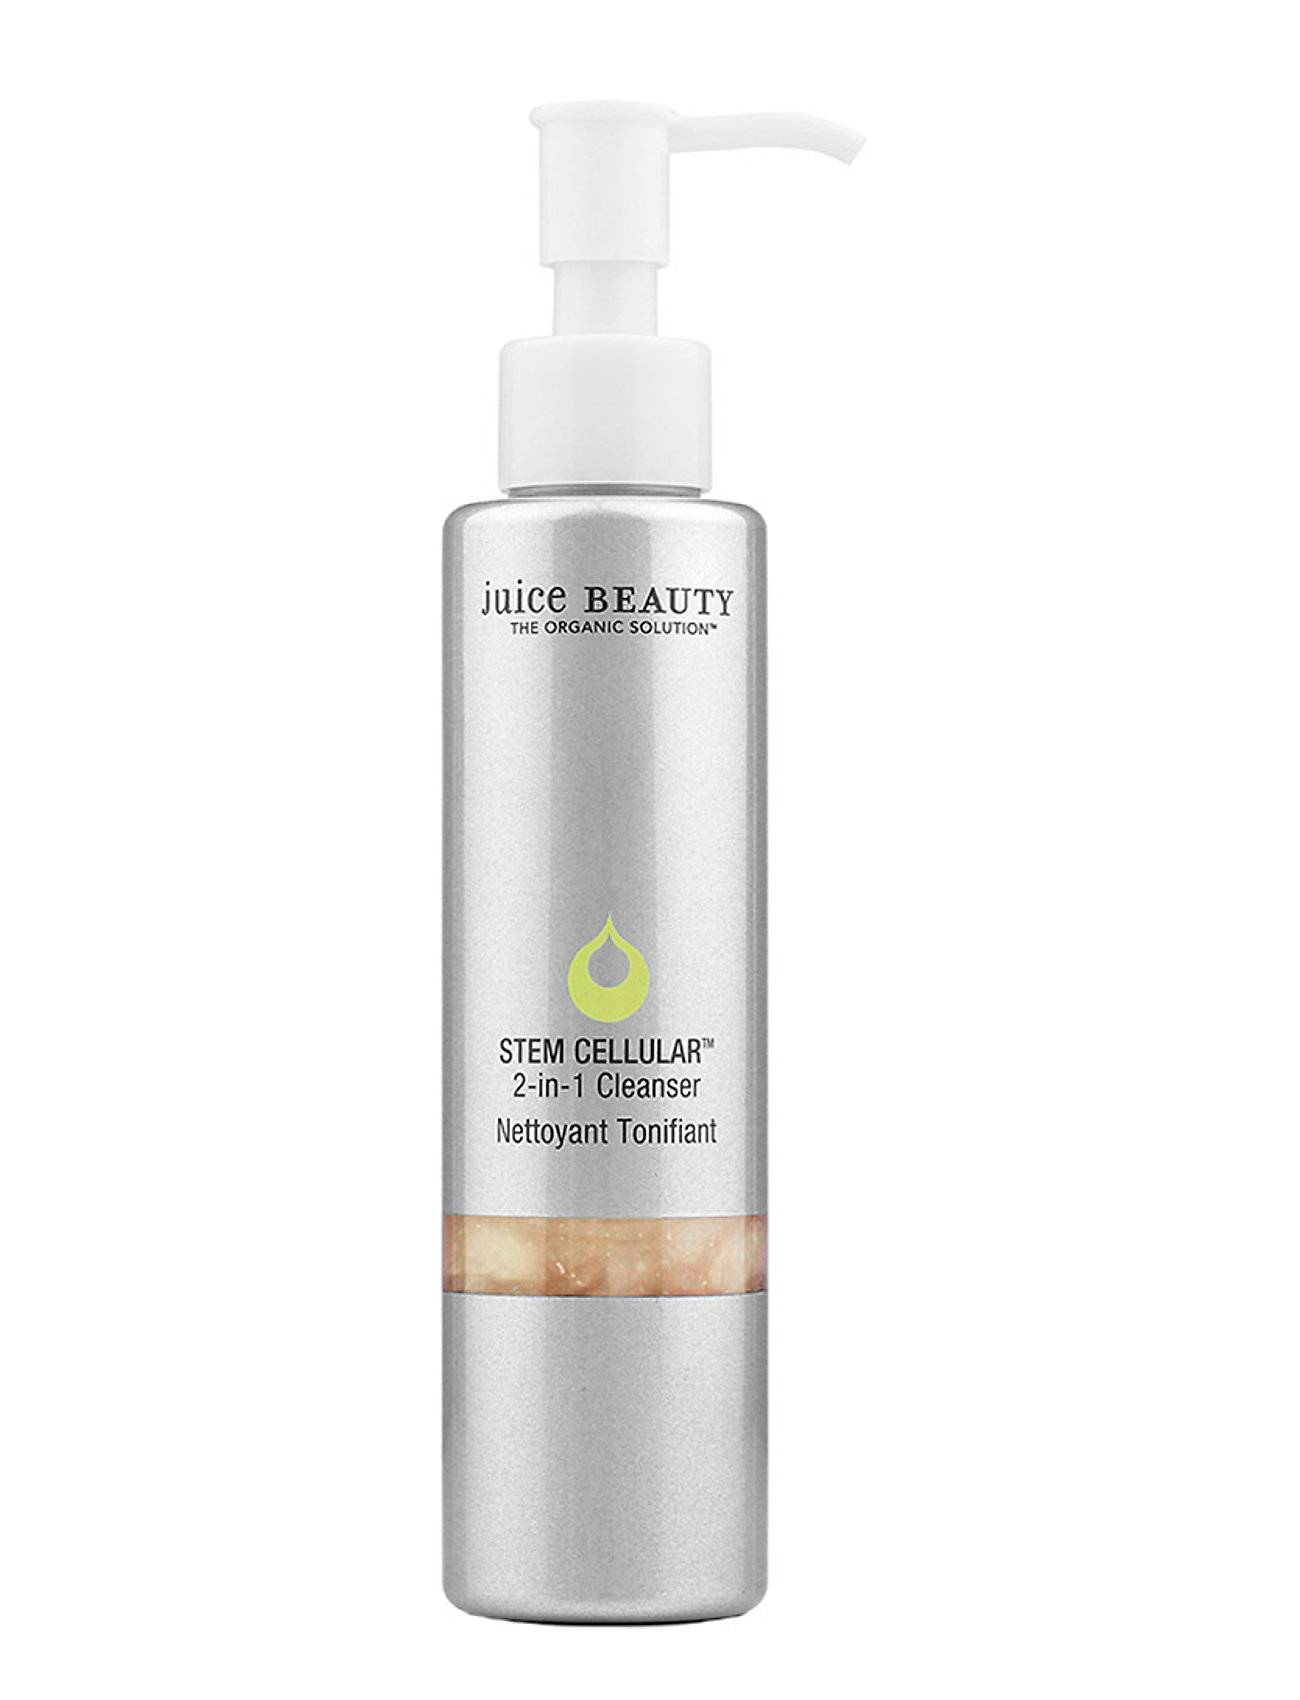 Juice Beauty Stem Cellular™ 2-In-1 Cleanser